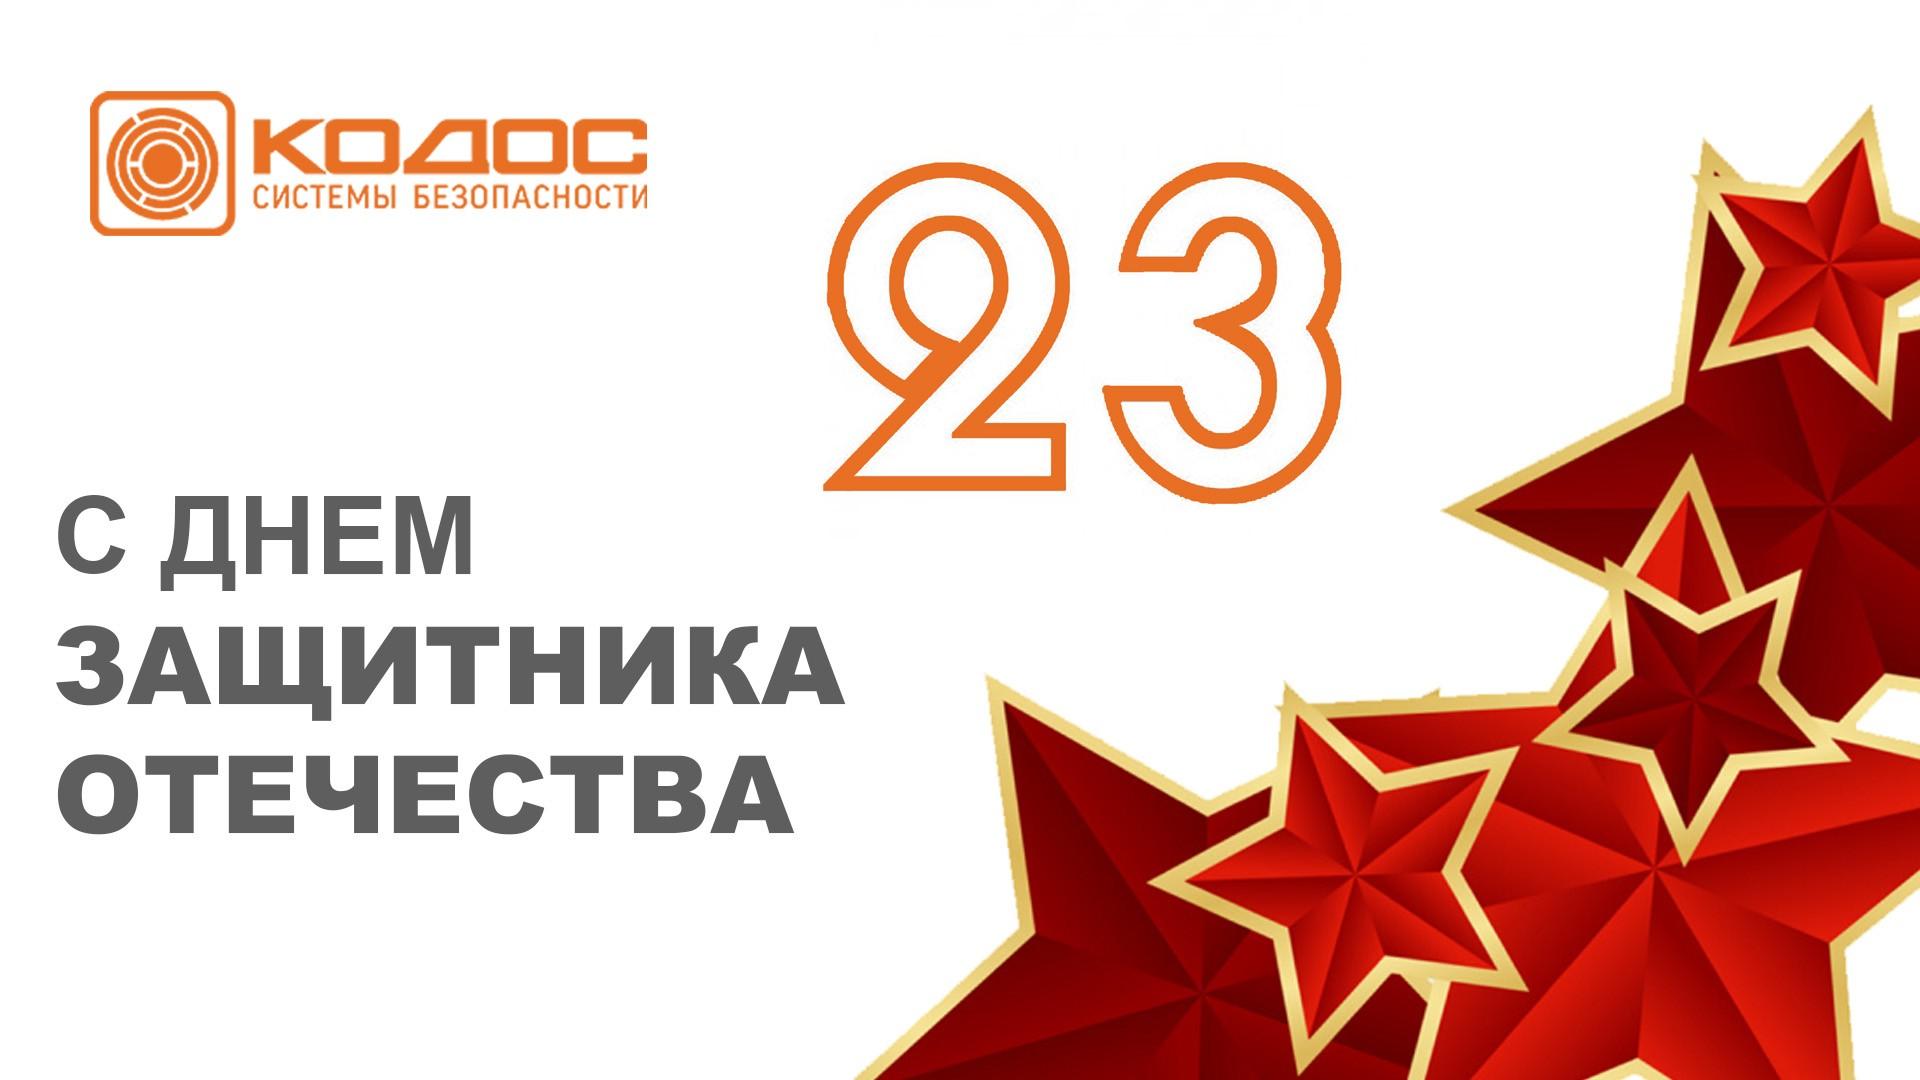 Компания КОДОС поздравляет вас с Днем защитника Отечества!